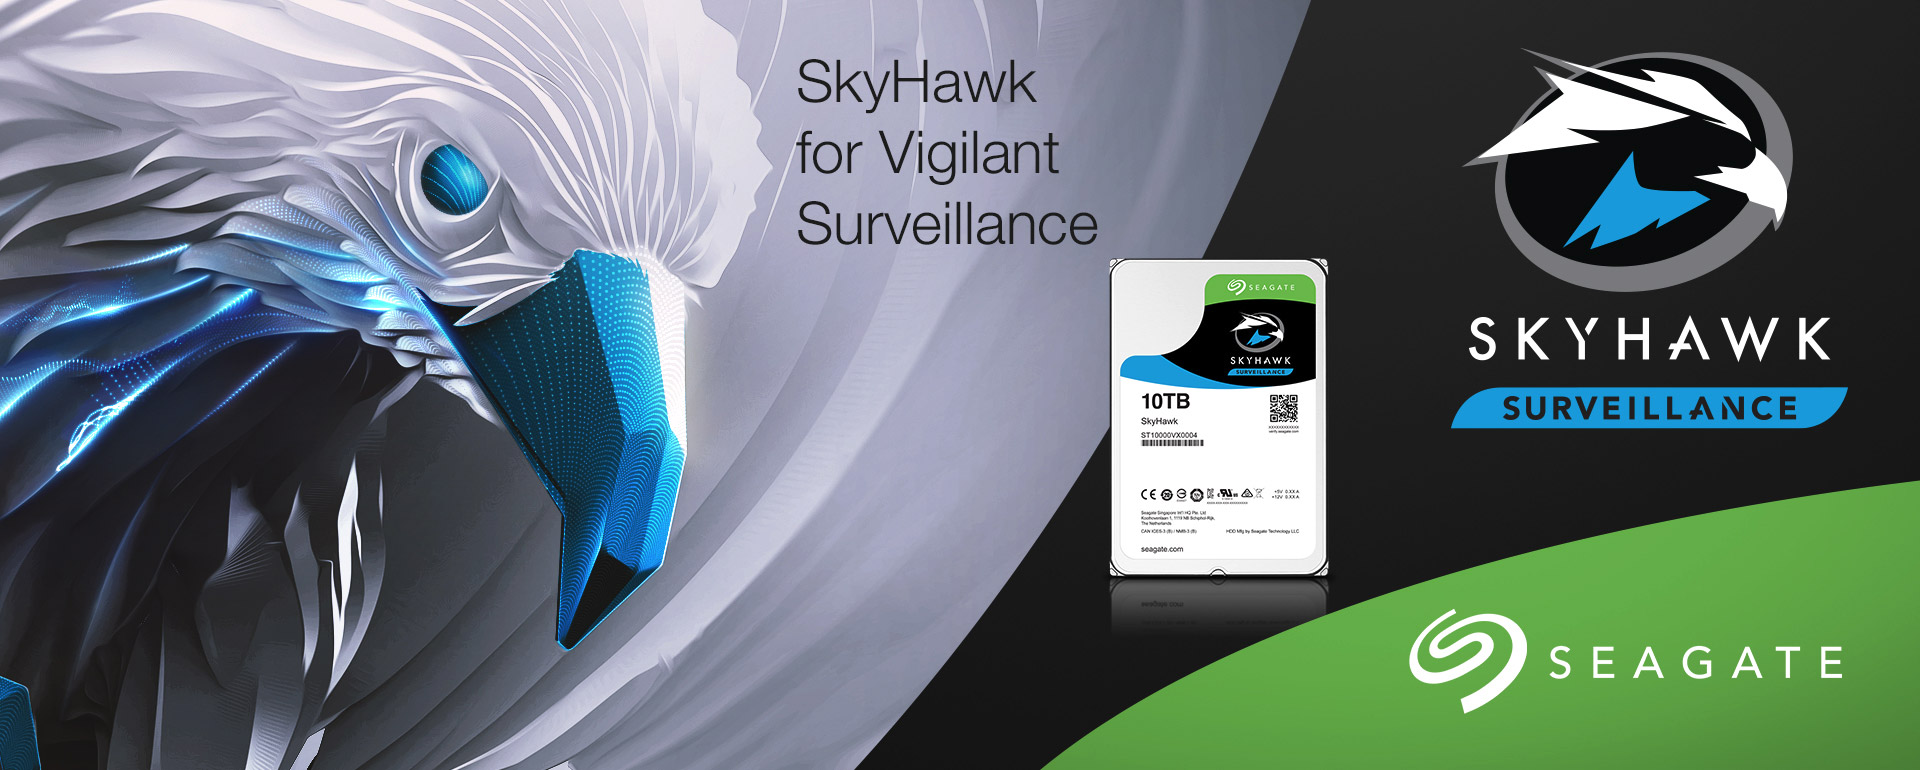 skyhawk-banner-top